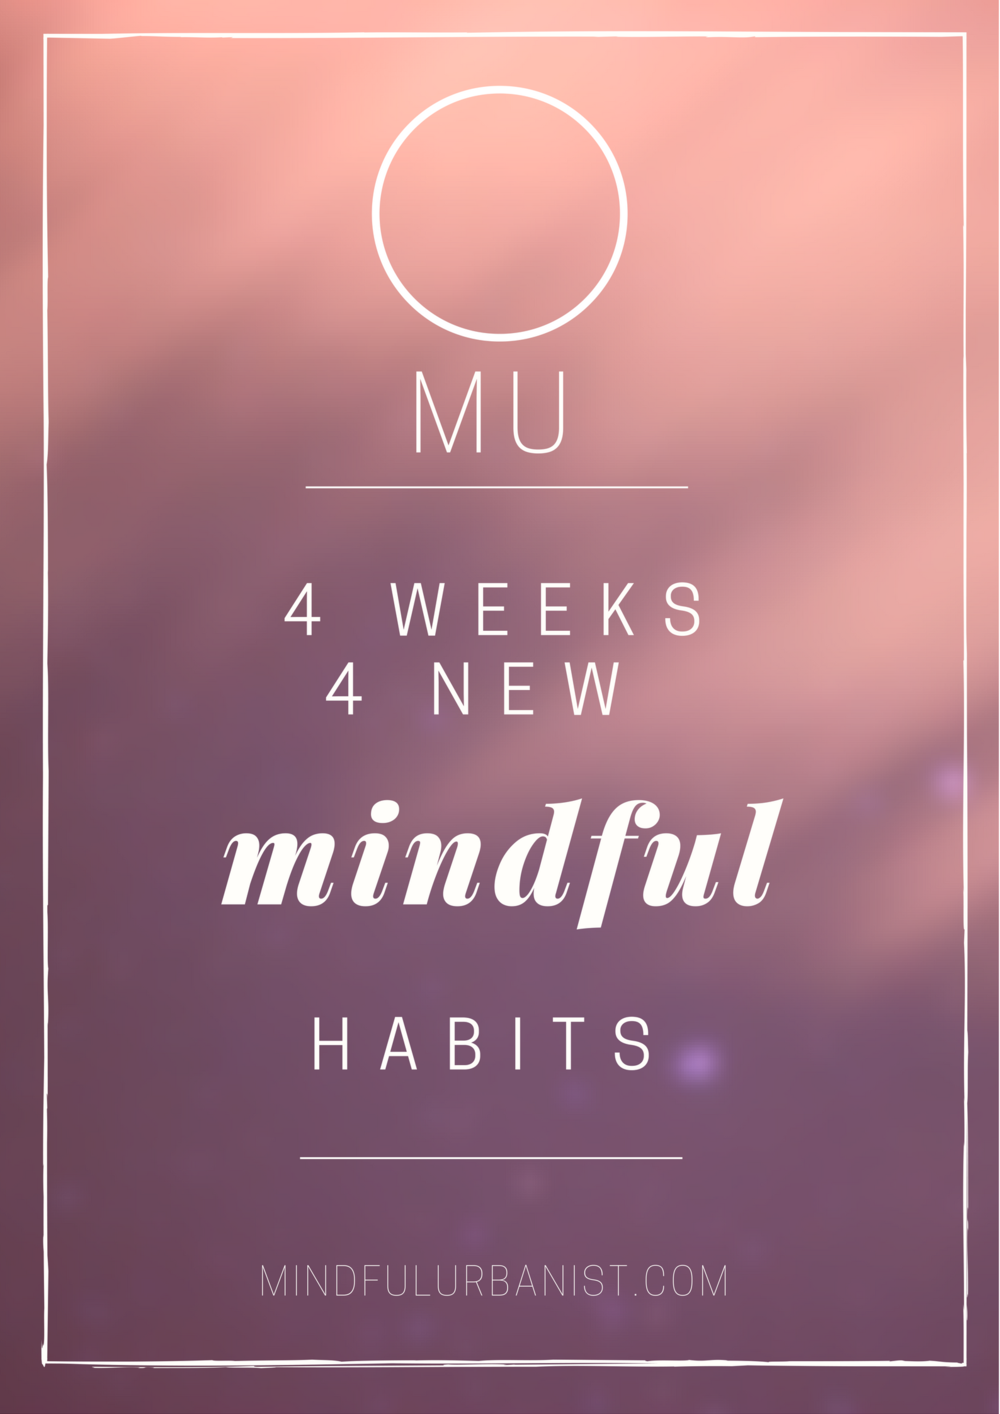 4 weeks 4 new mindful habits